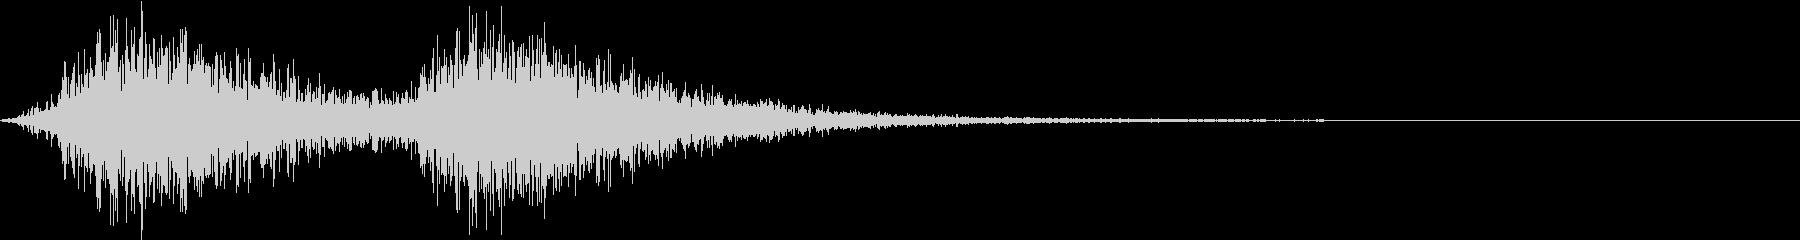 Battle 戦闘エフェクト音 2の未再生の波形